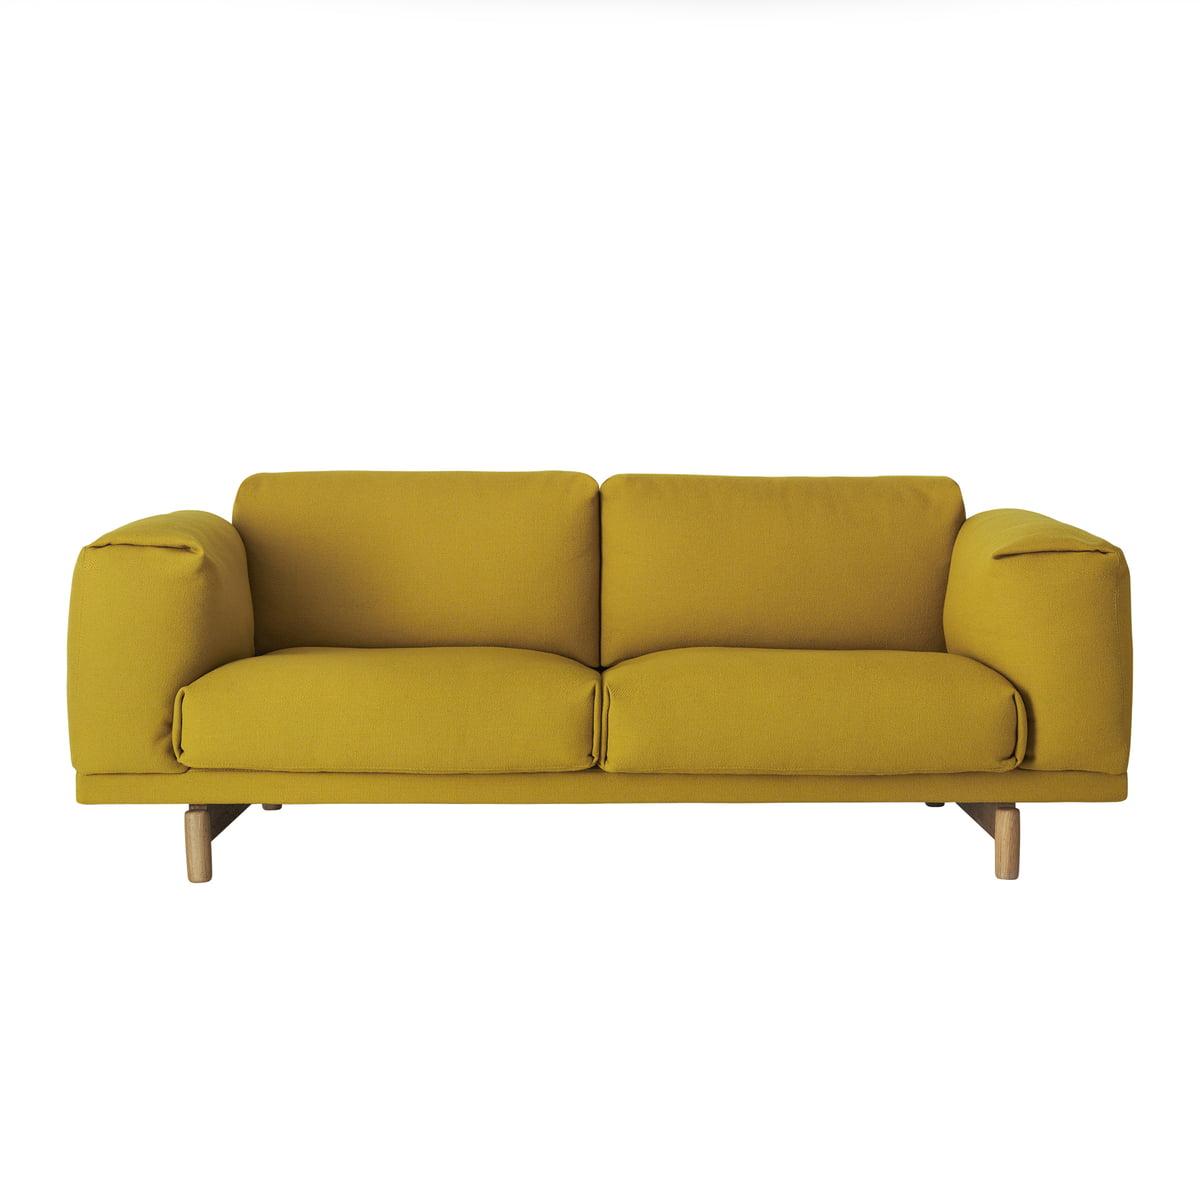 Muuto rest sofa 2 sitzer senfgelb hallingdal 457 eiche natur frei